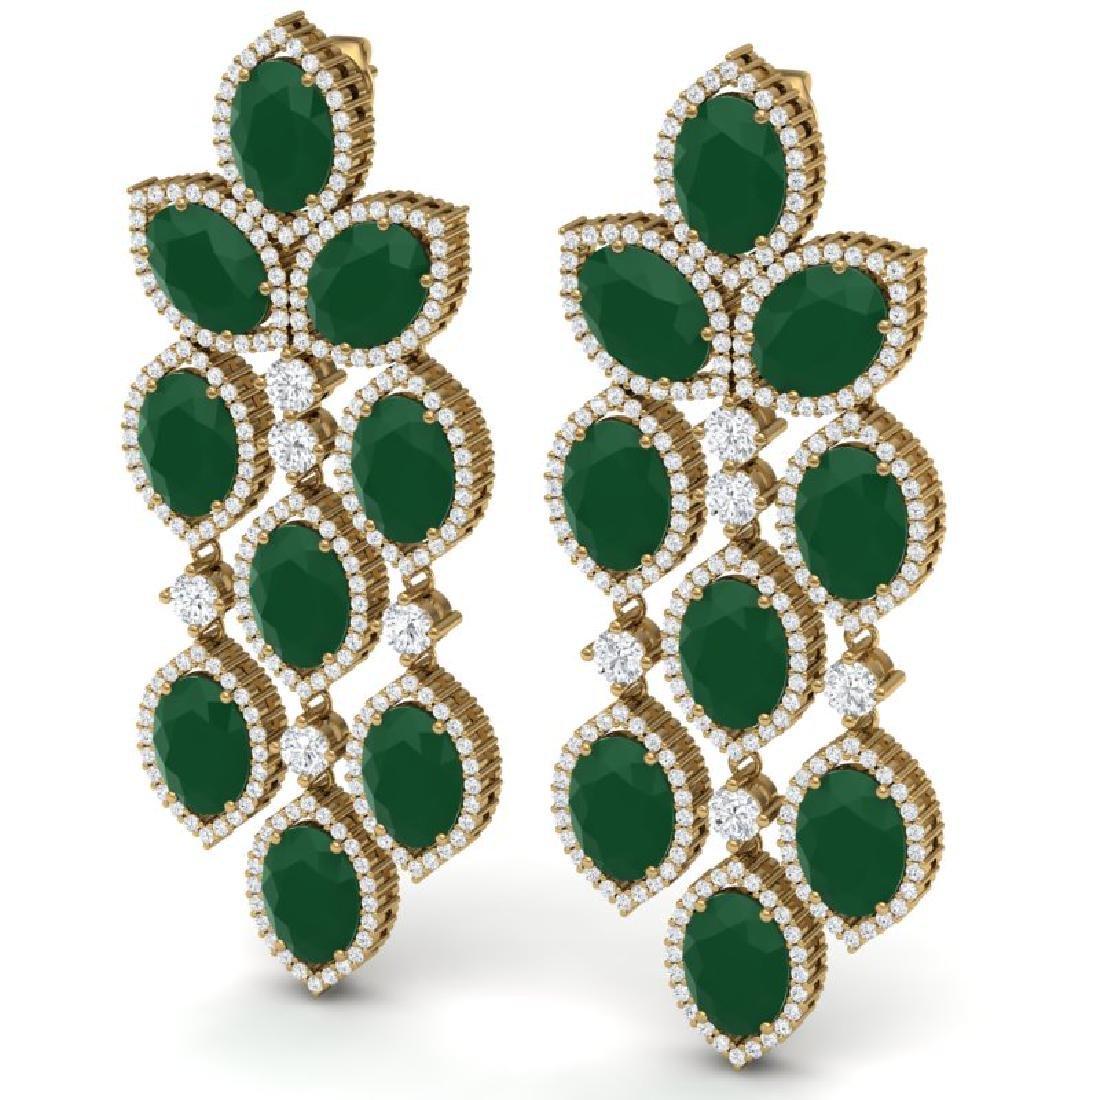 26.15 CTW Royalty Emerald & VS Diamond Earrings 18K - 2